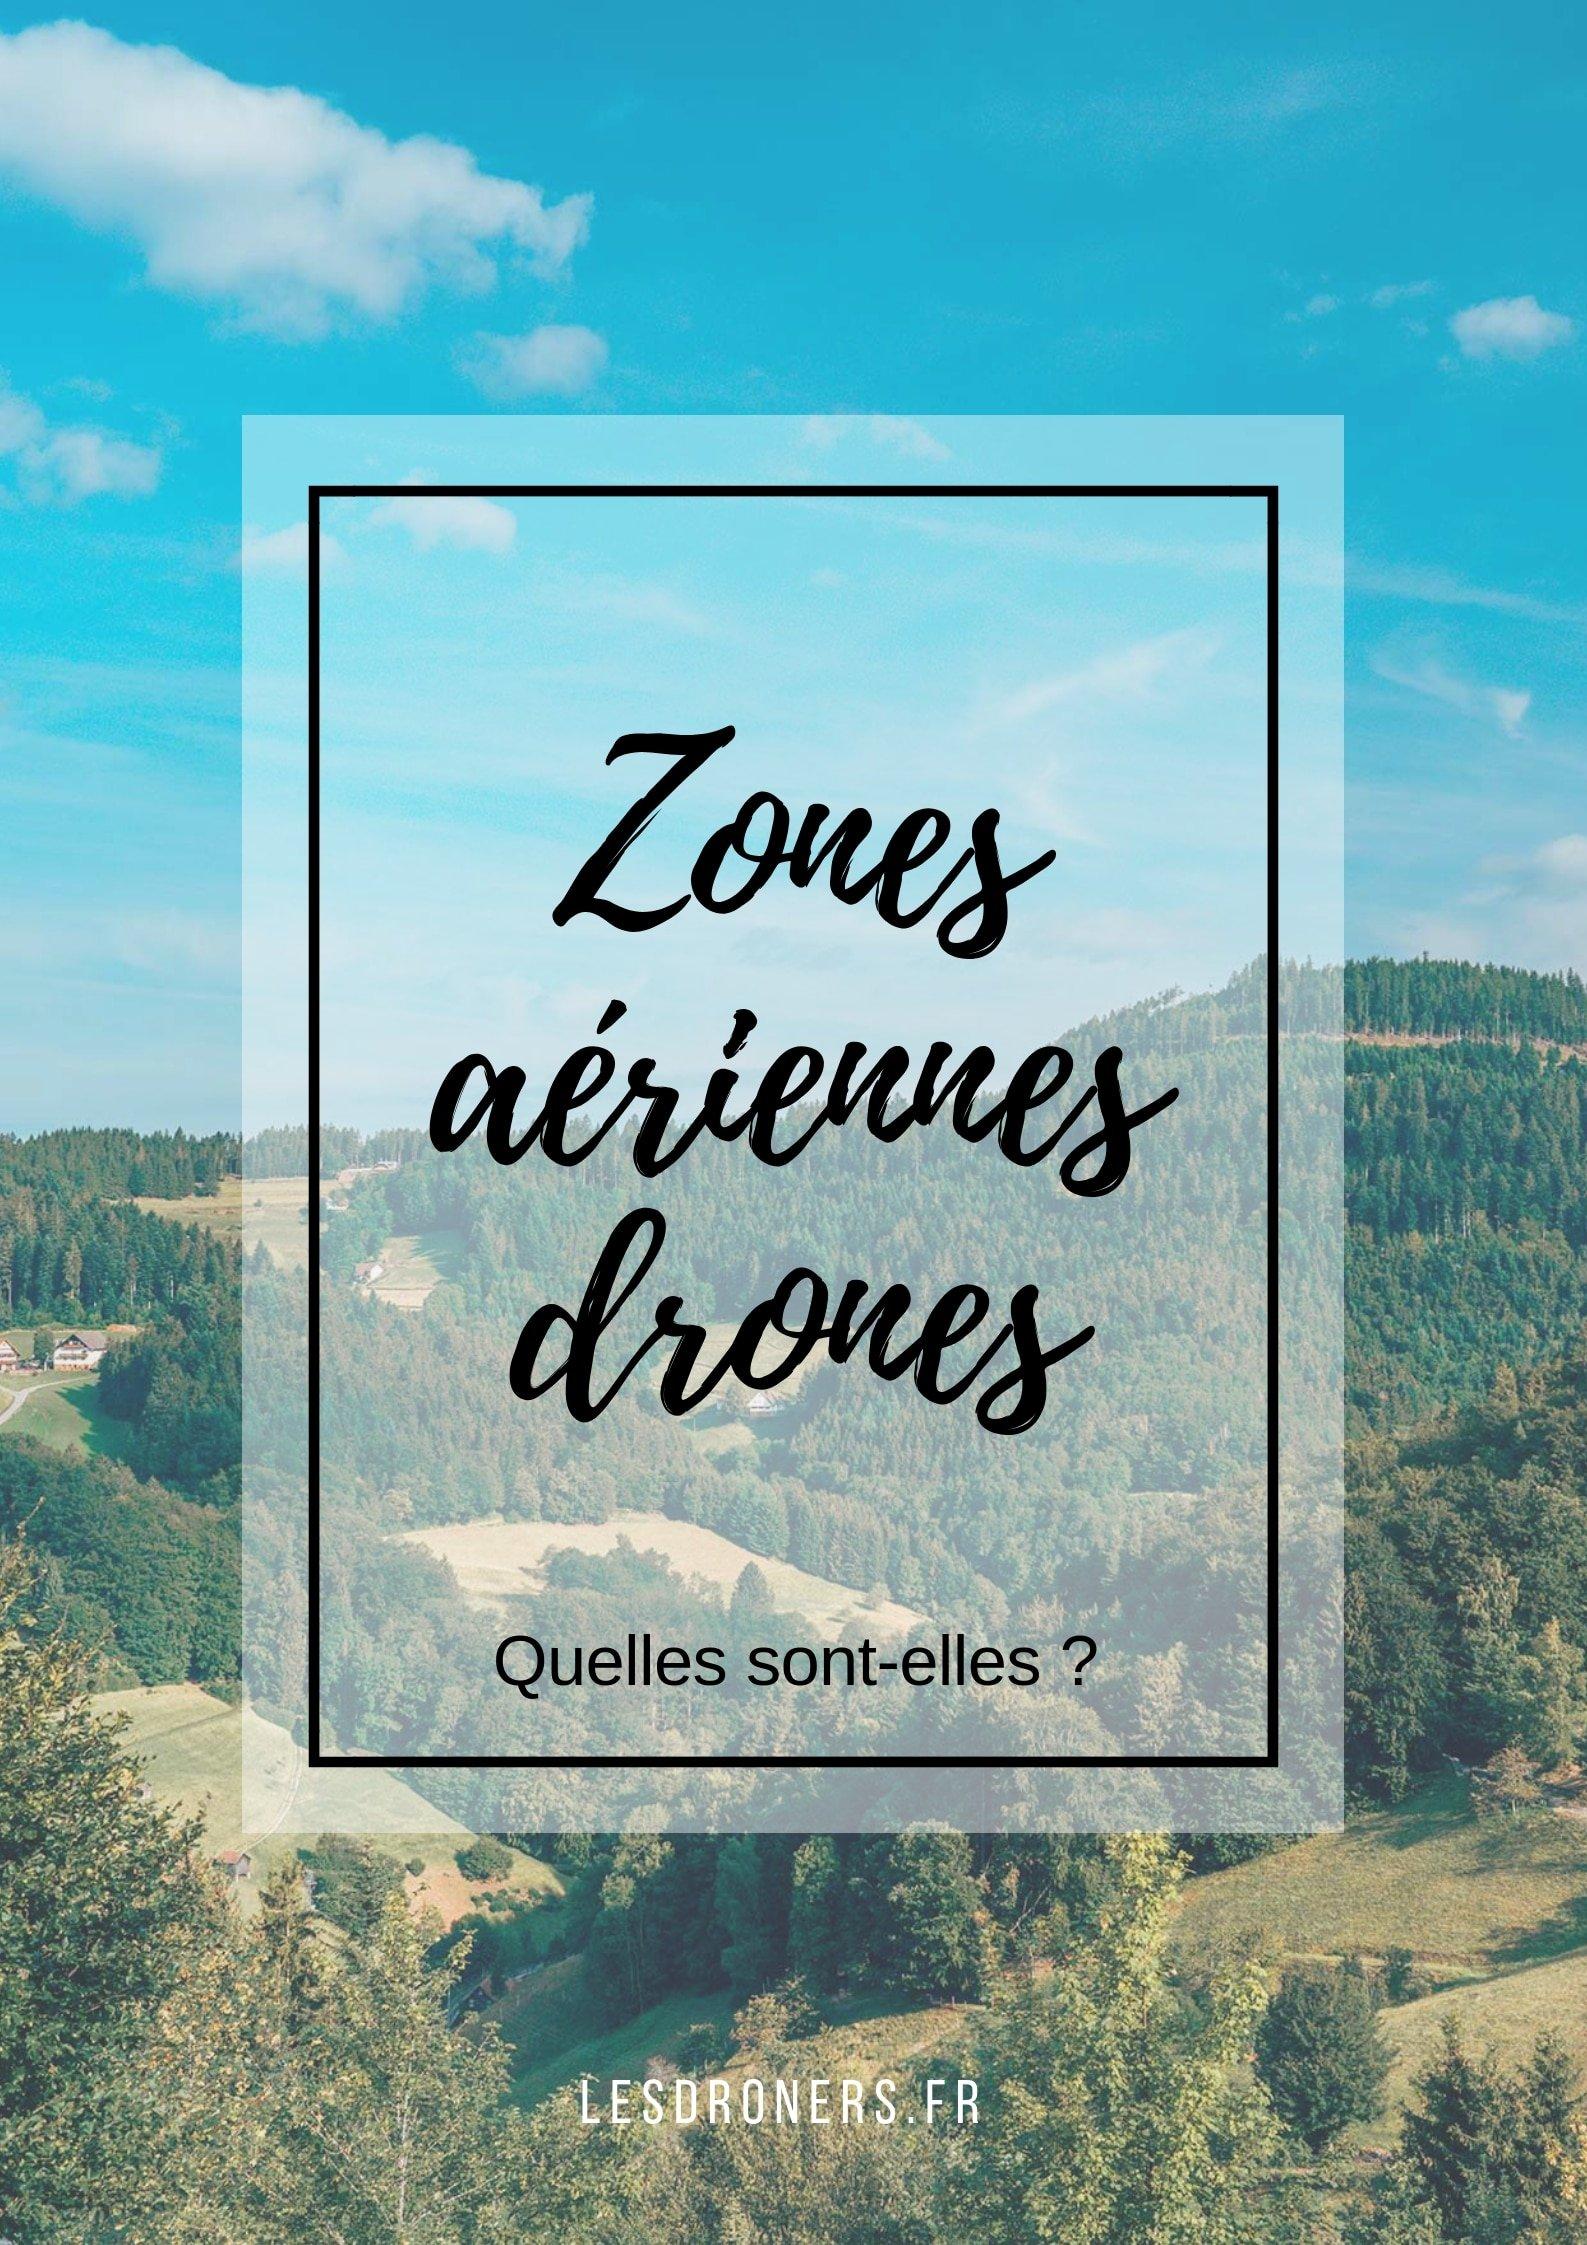 Zones aeriennes drones